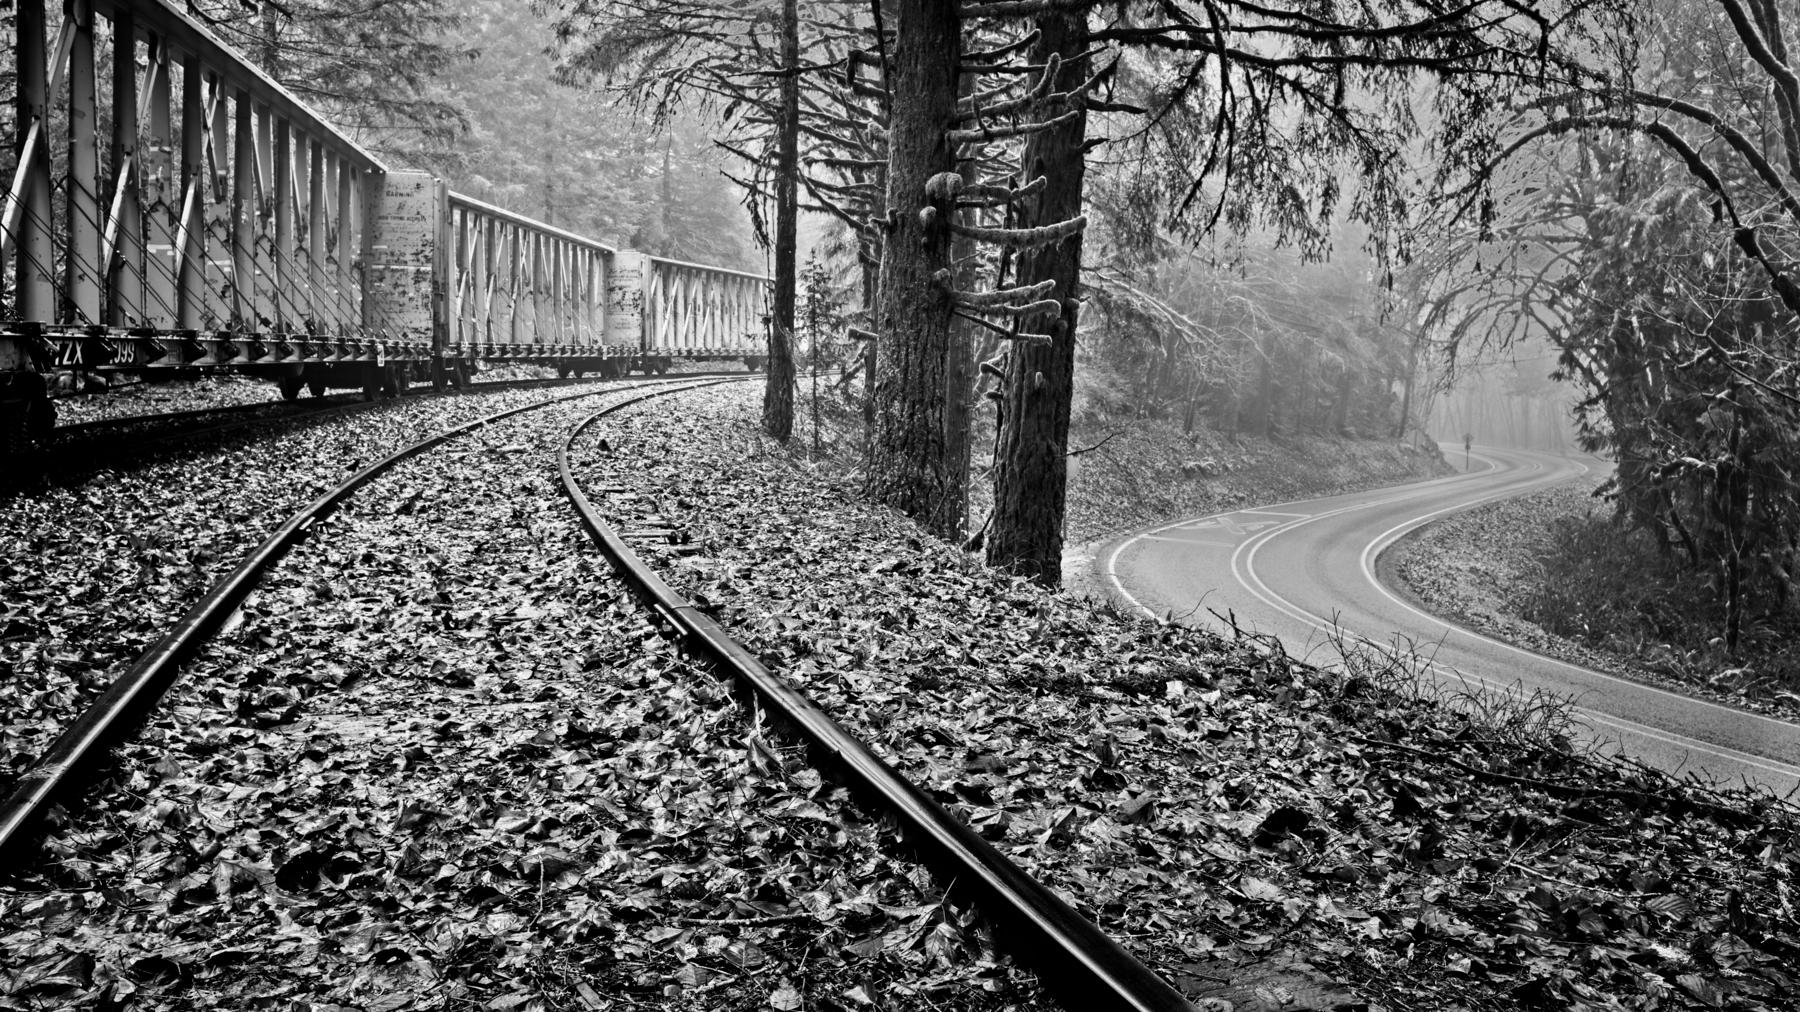 Rural Railroad